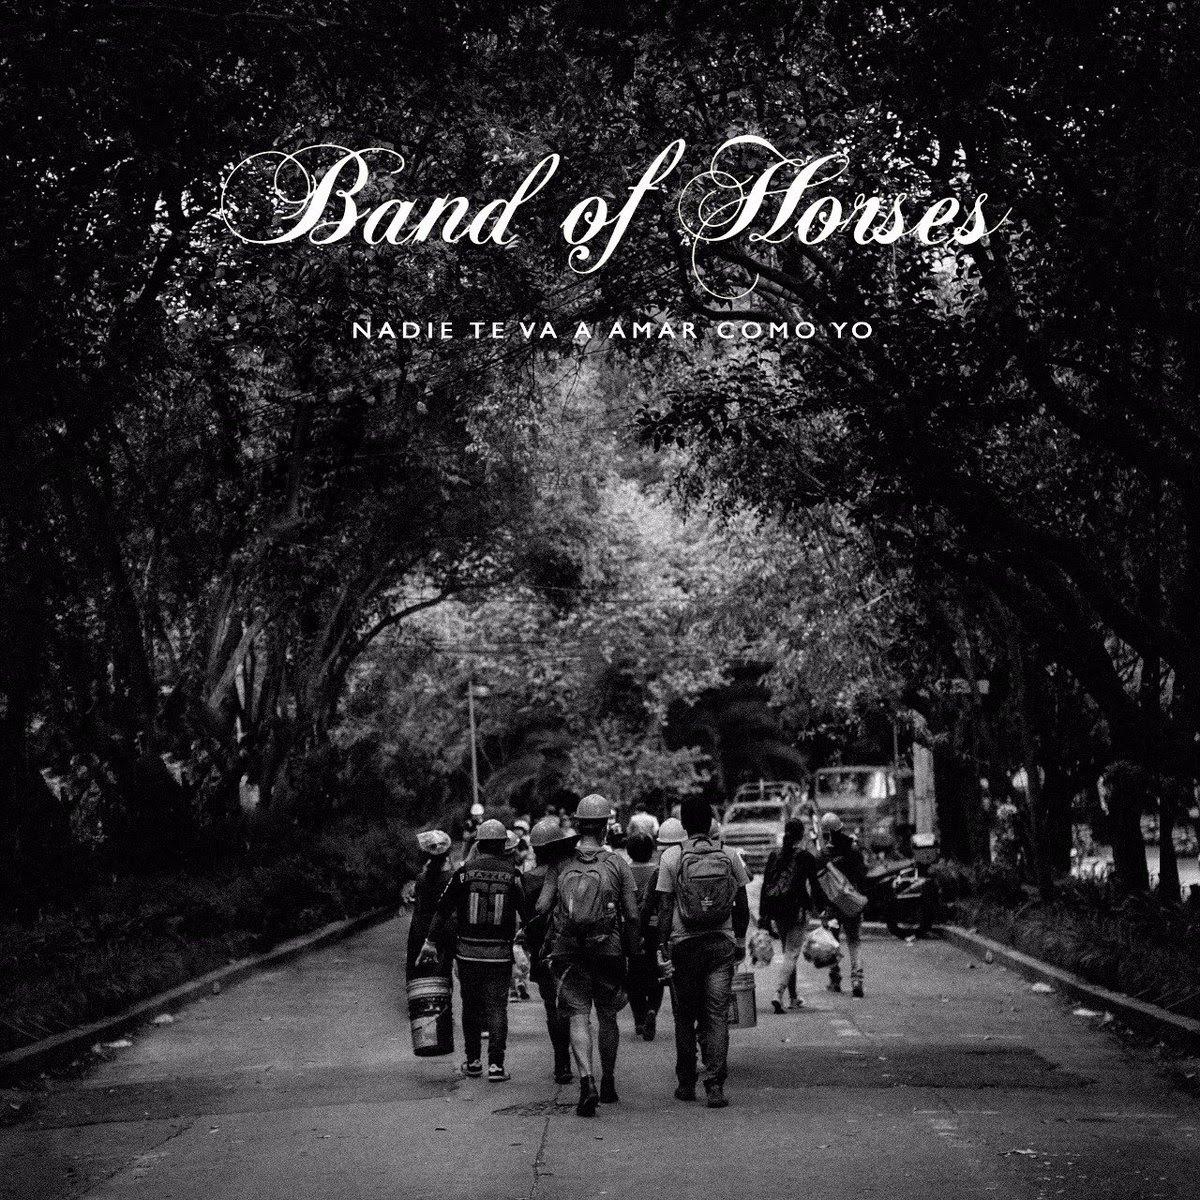 Band of Horses con 'Nadie te va a amar como yo'